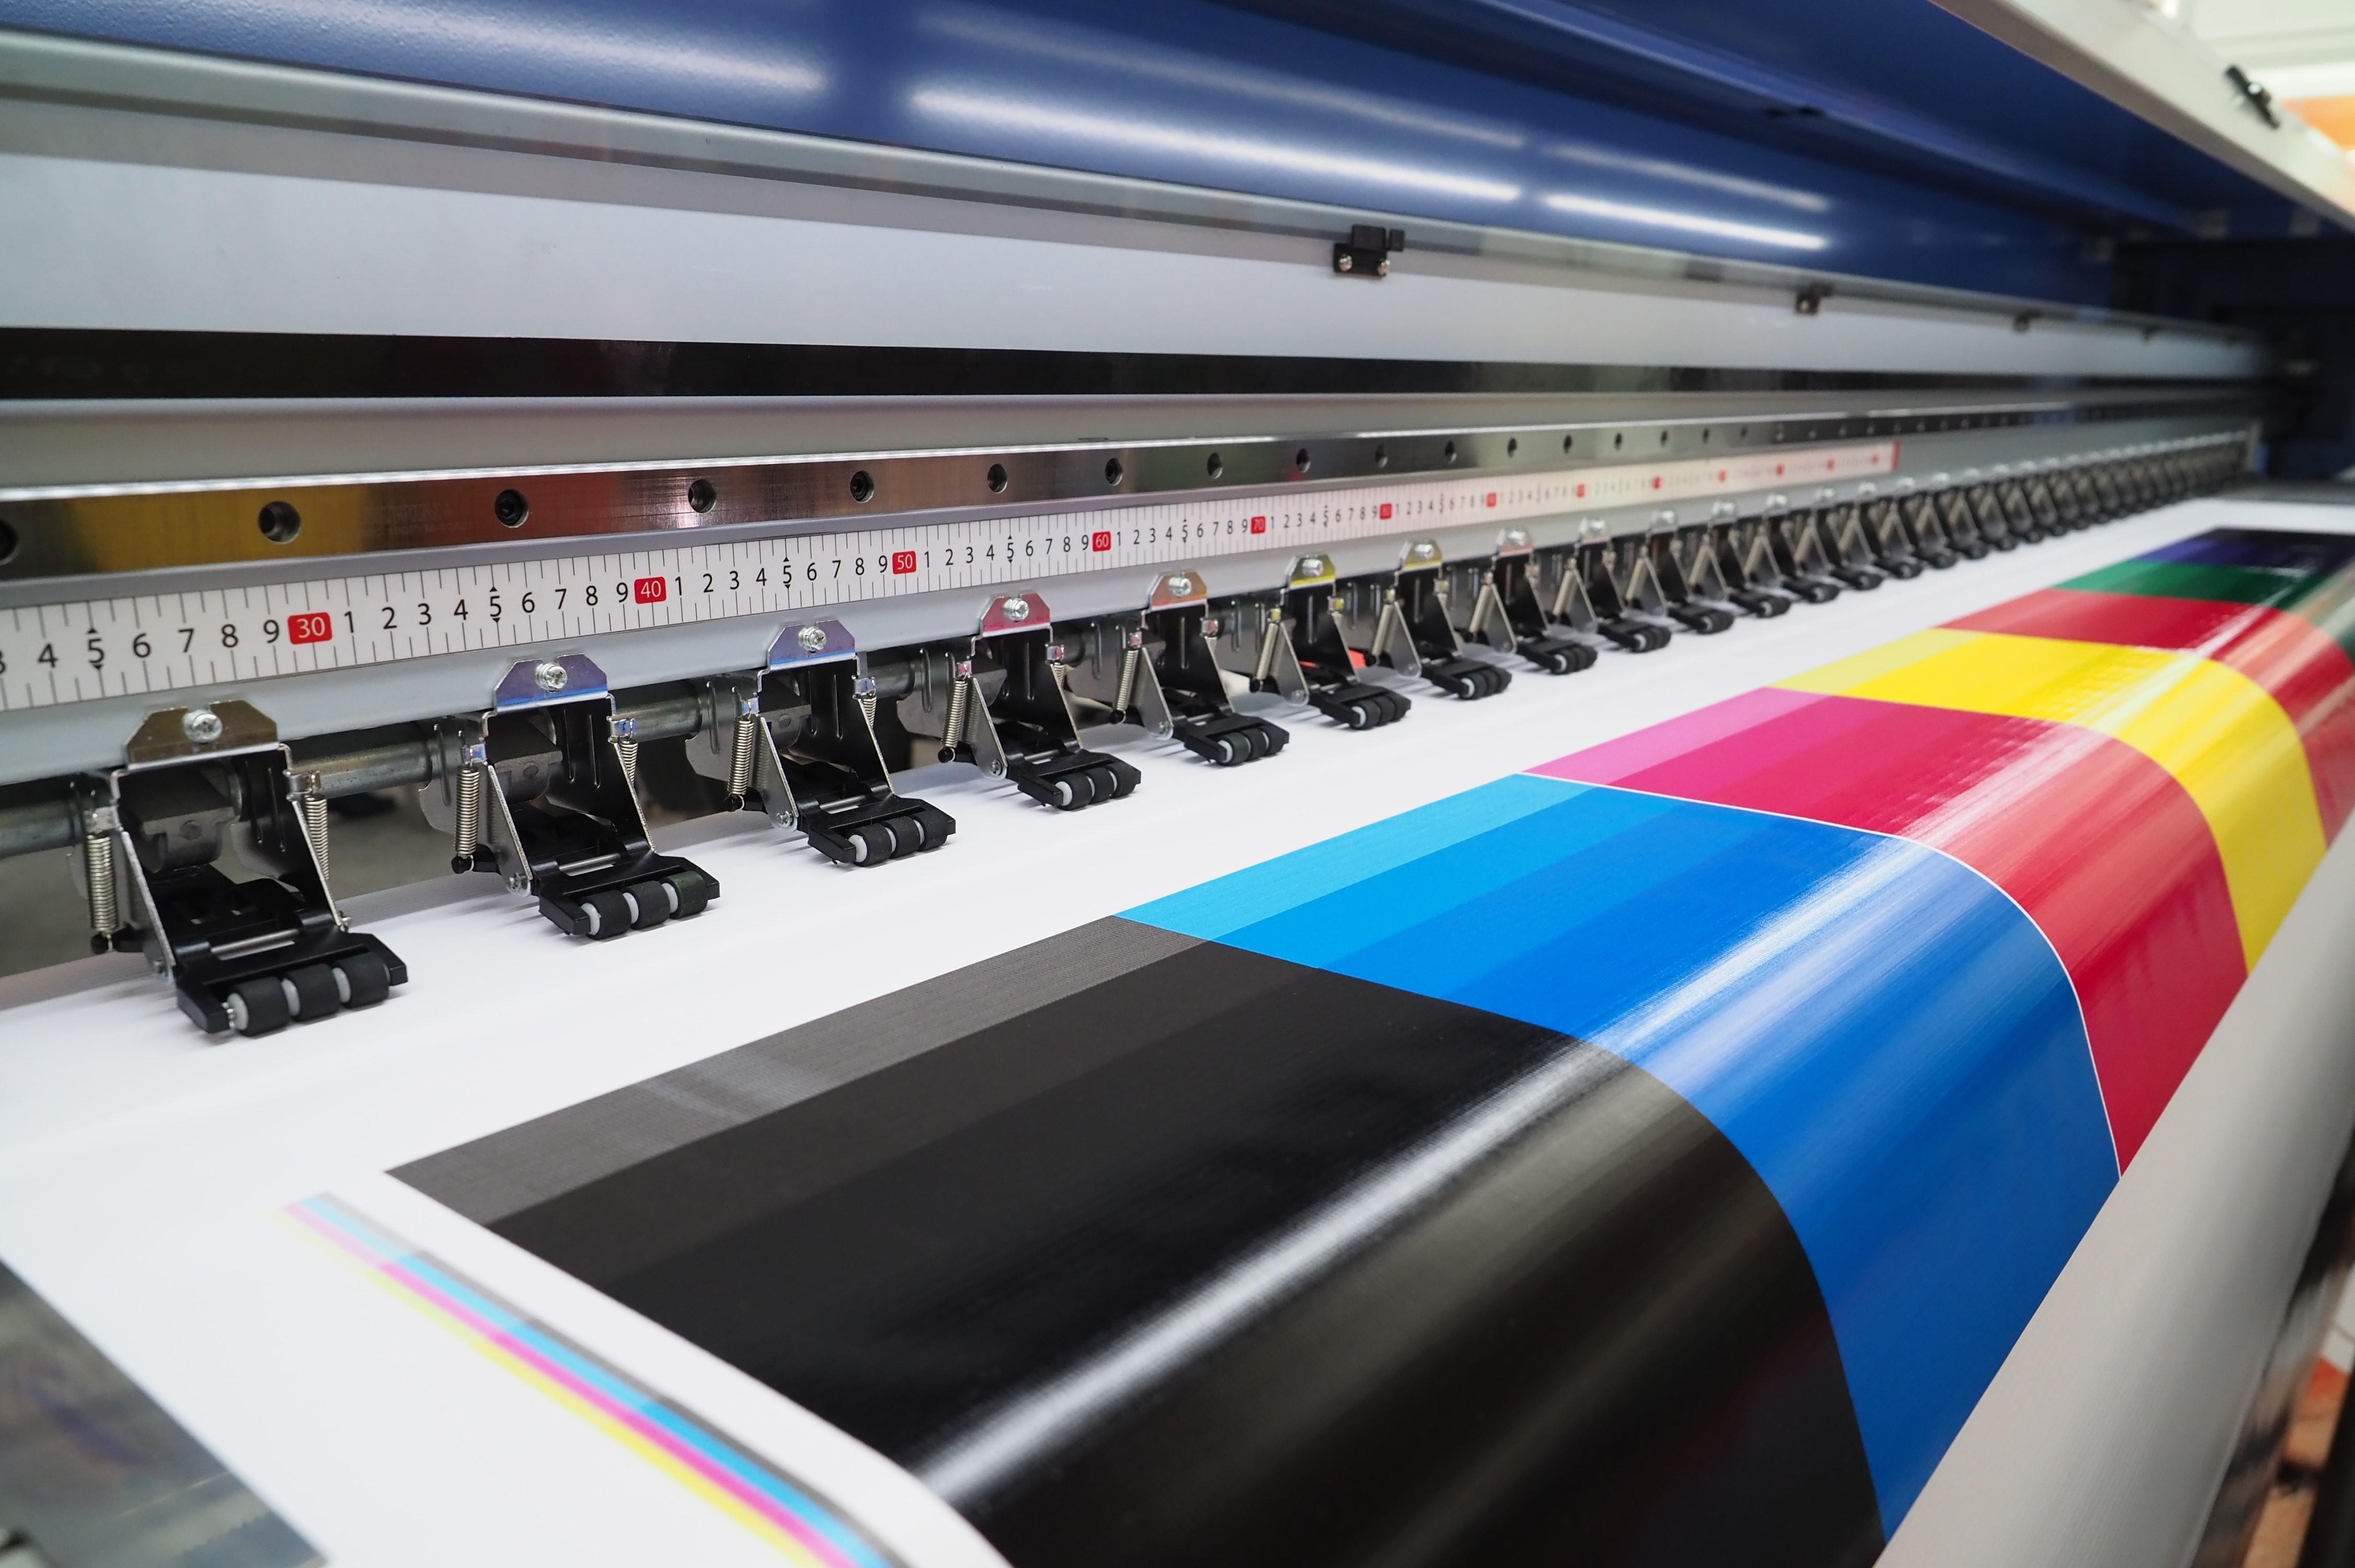 Технология широкоформатной печати